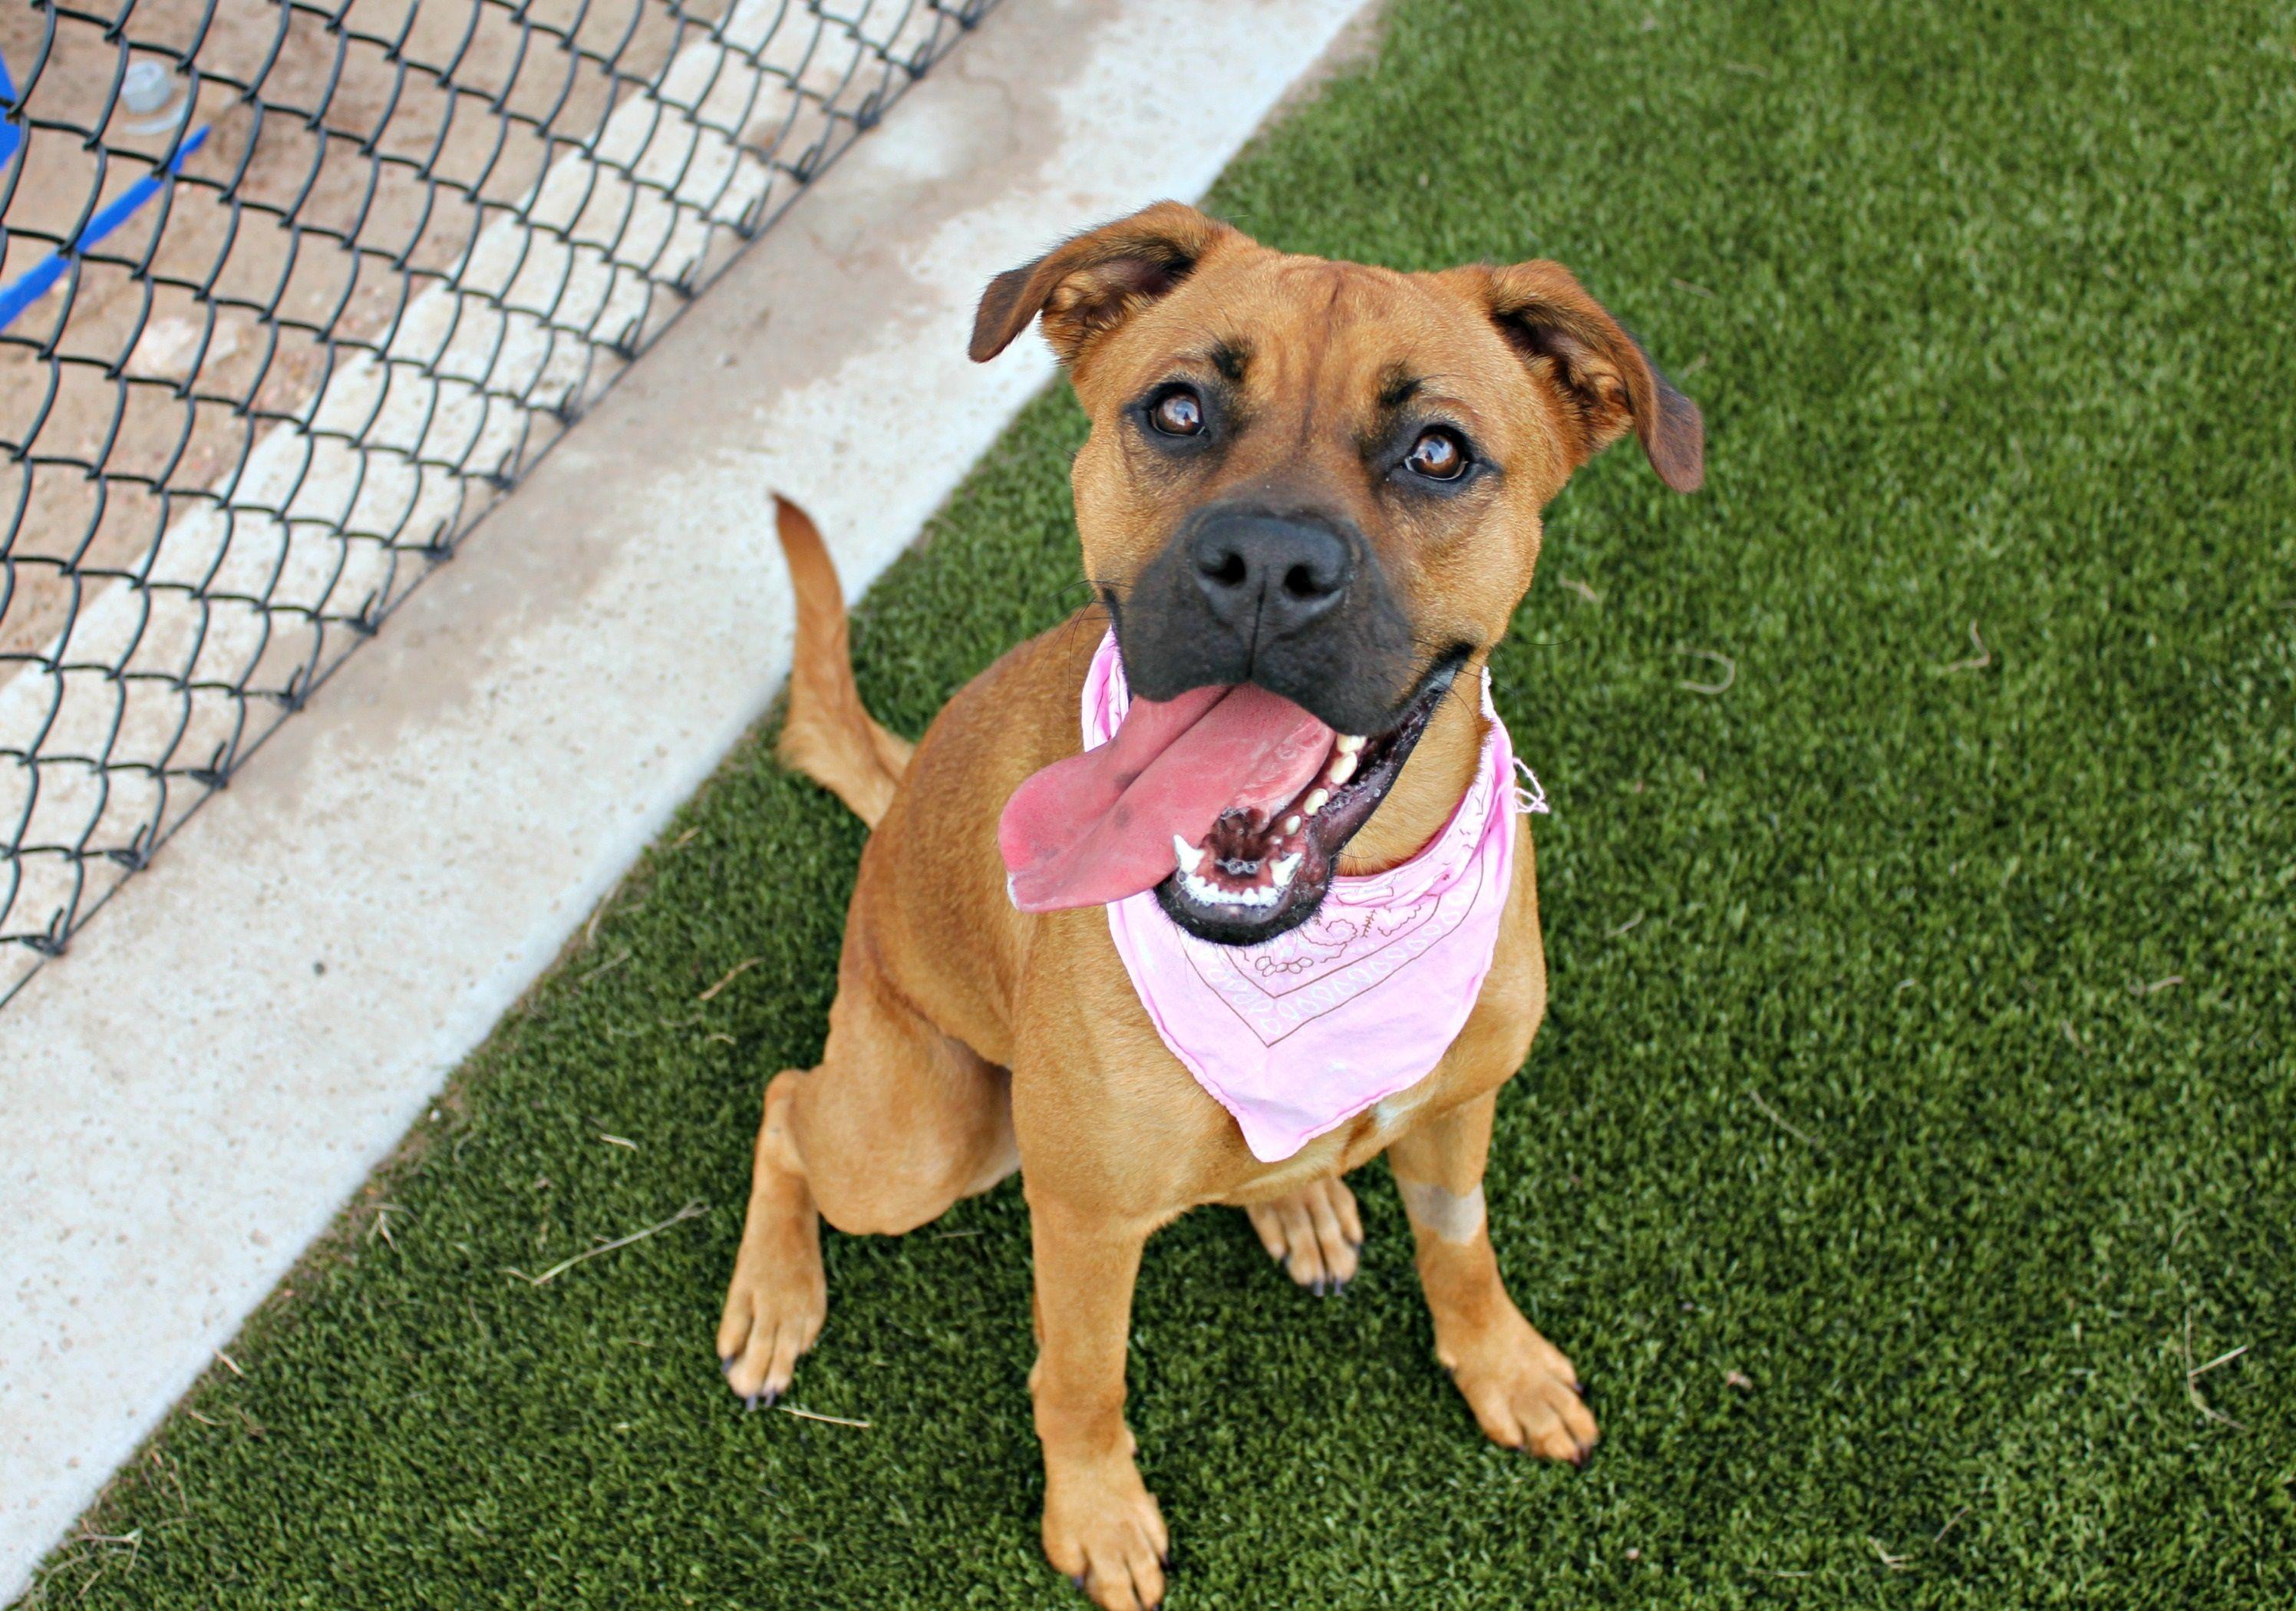 Boxer dog for Adoption in Bryan, TX. ADN547790 on